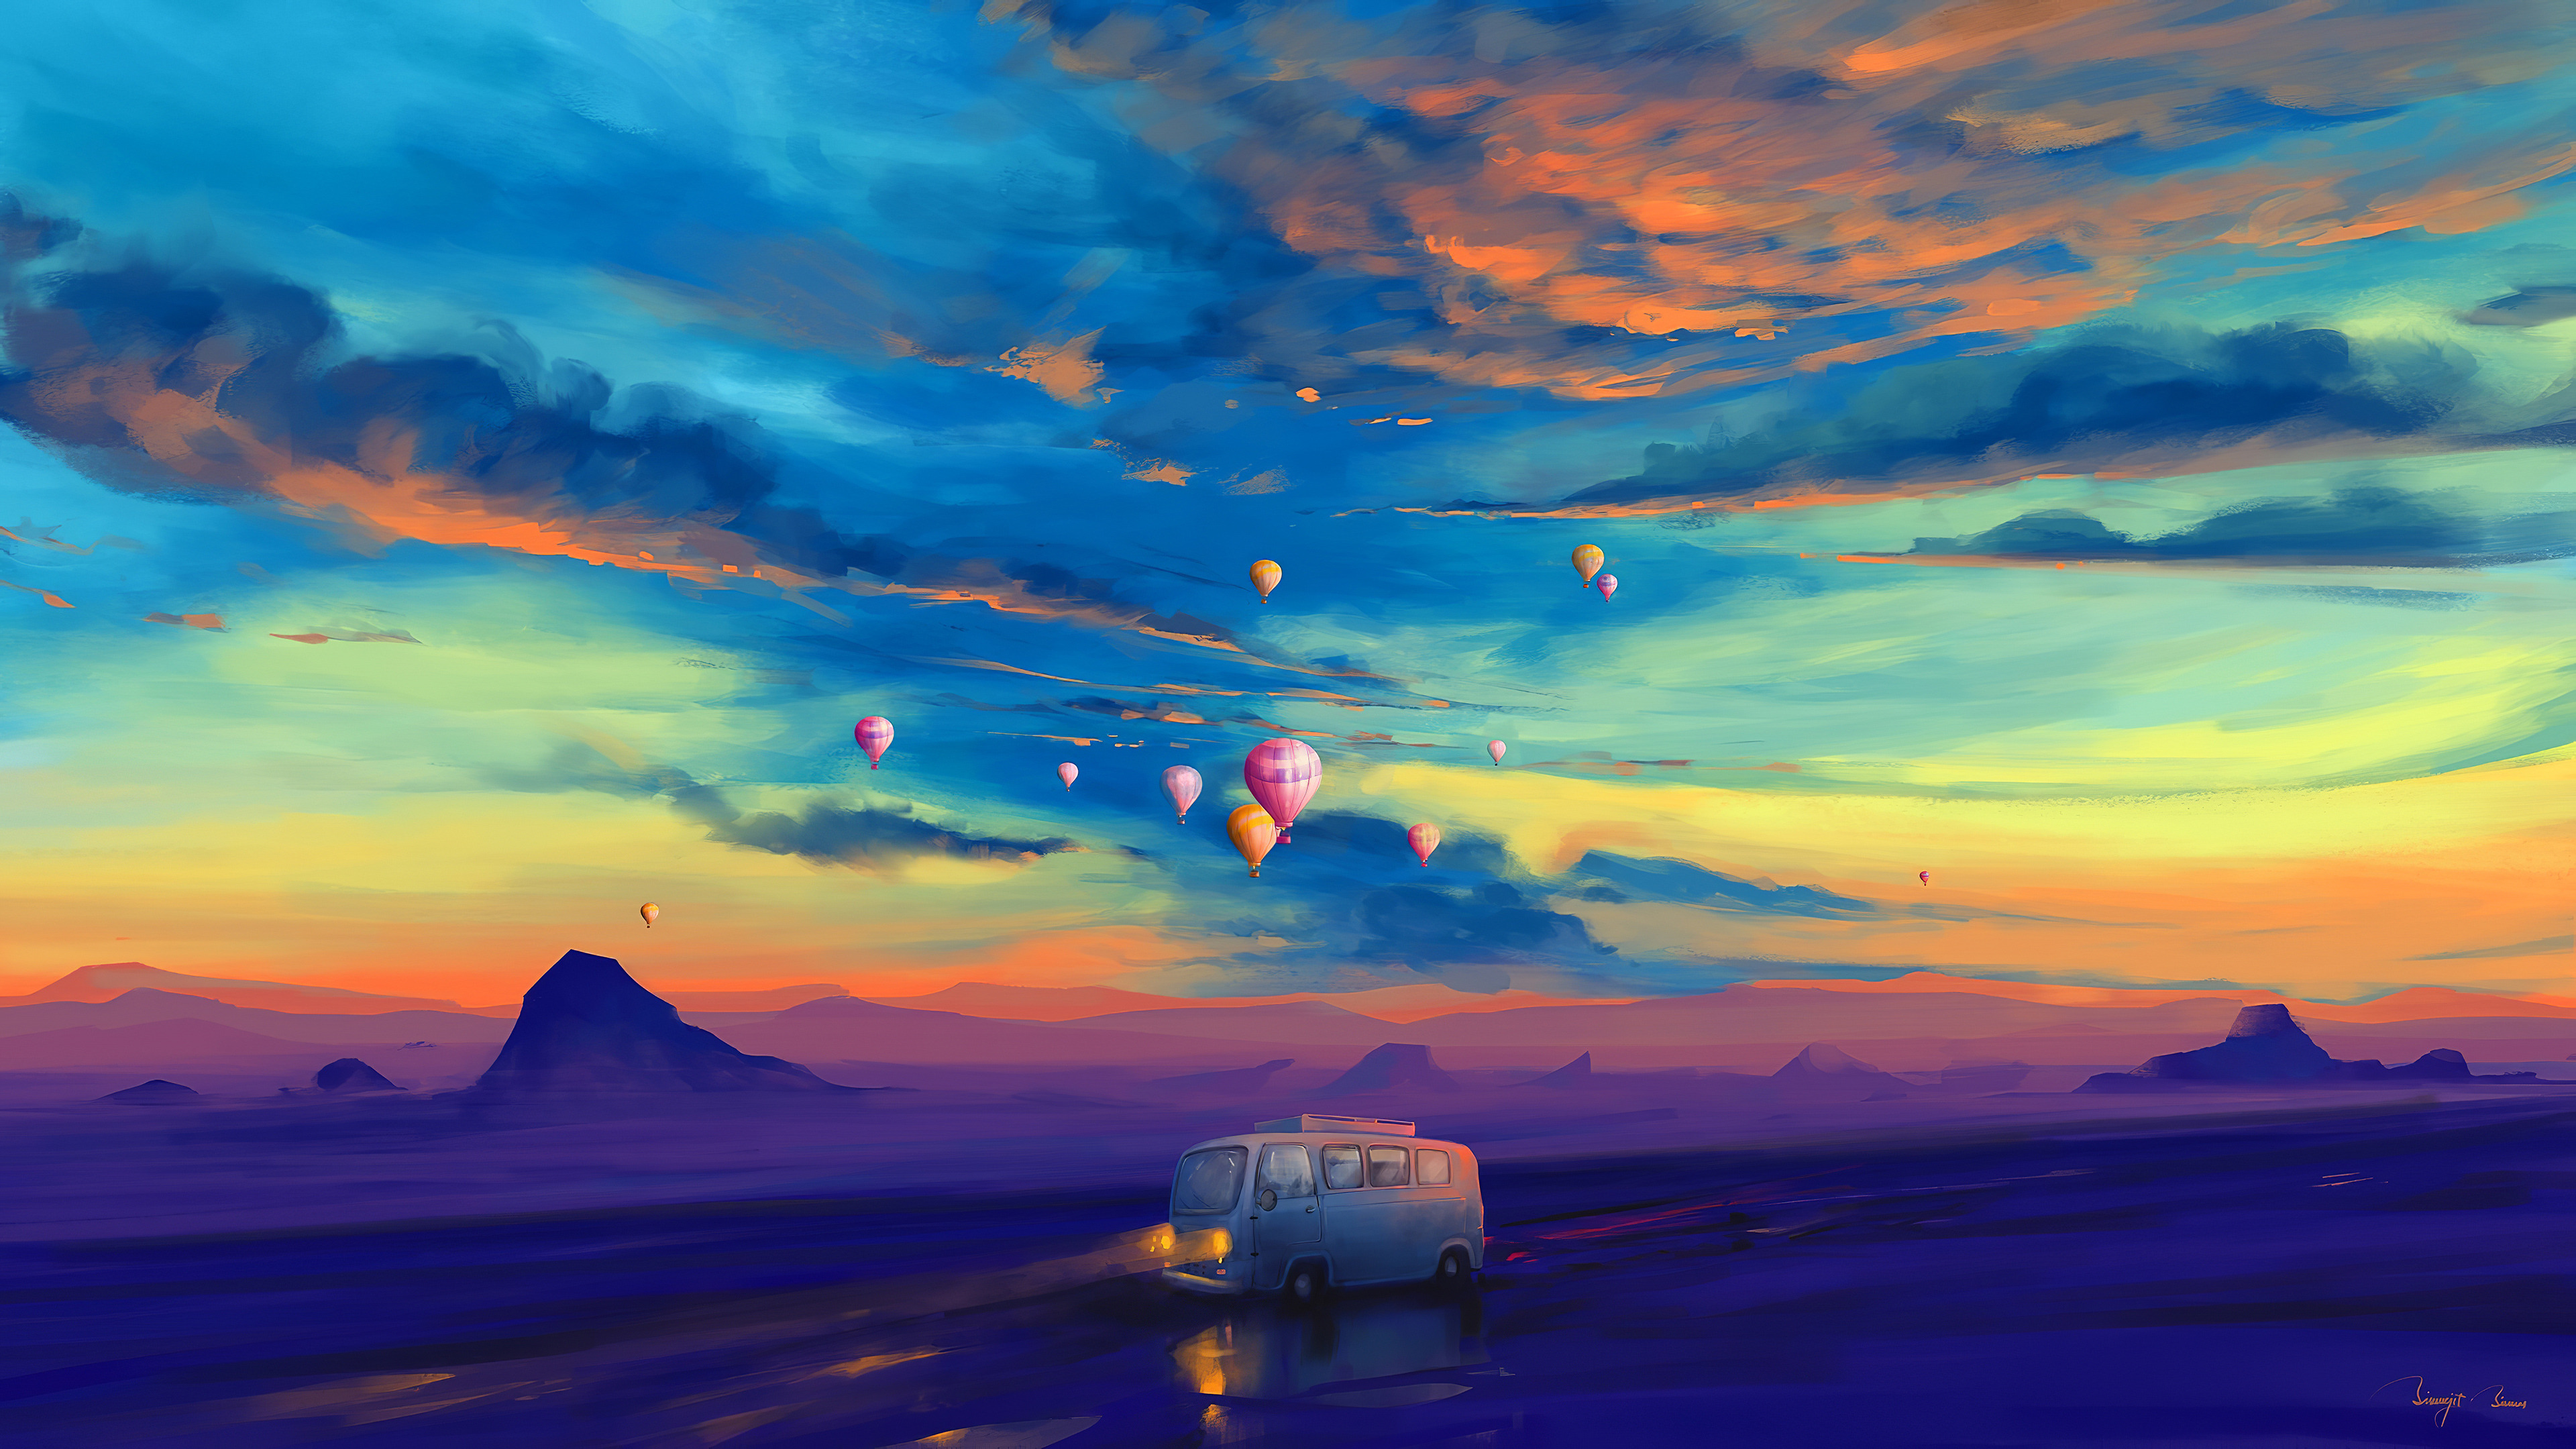 Fondos de pantalla Camioneta y globos aerostaticos en un atardecer colorido